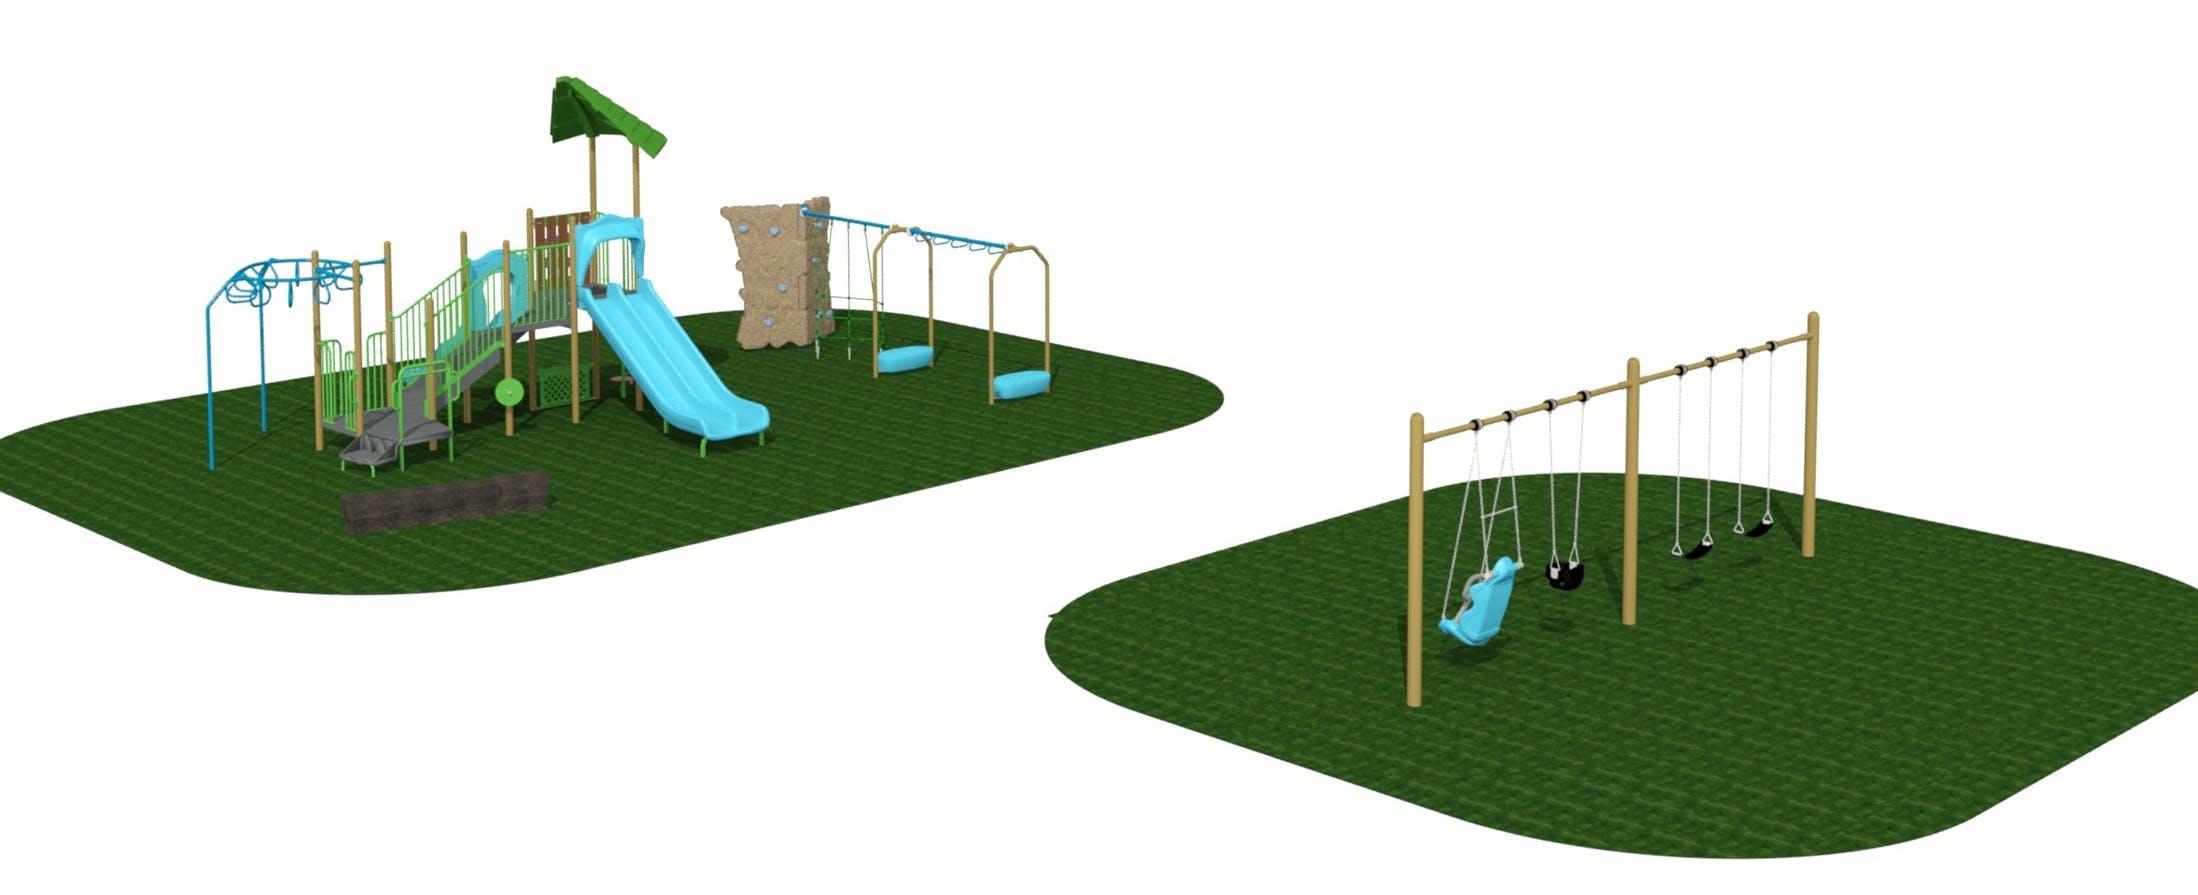 Corwin Park Playground Rendering